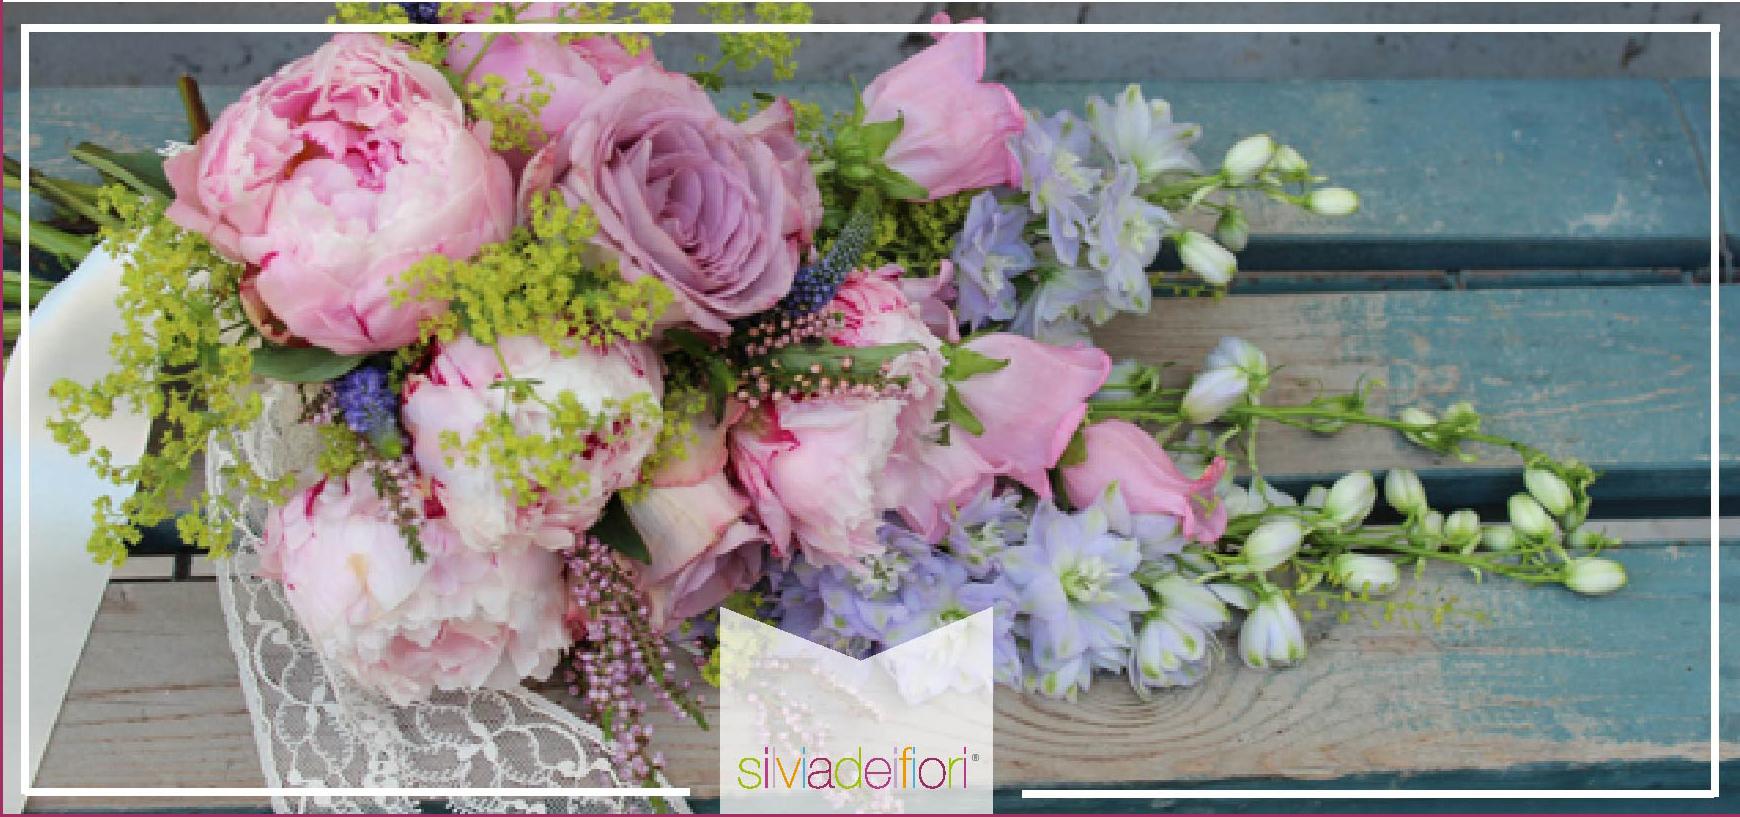 Bouquet Sposa Carta Da Zucchero.Matrimonio Boho Chic Tendenza 2016 Silviadeifiori